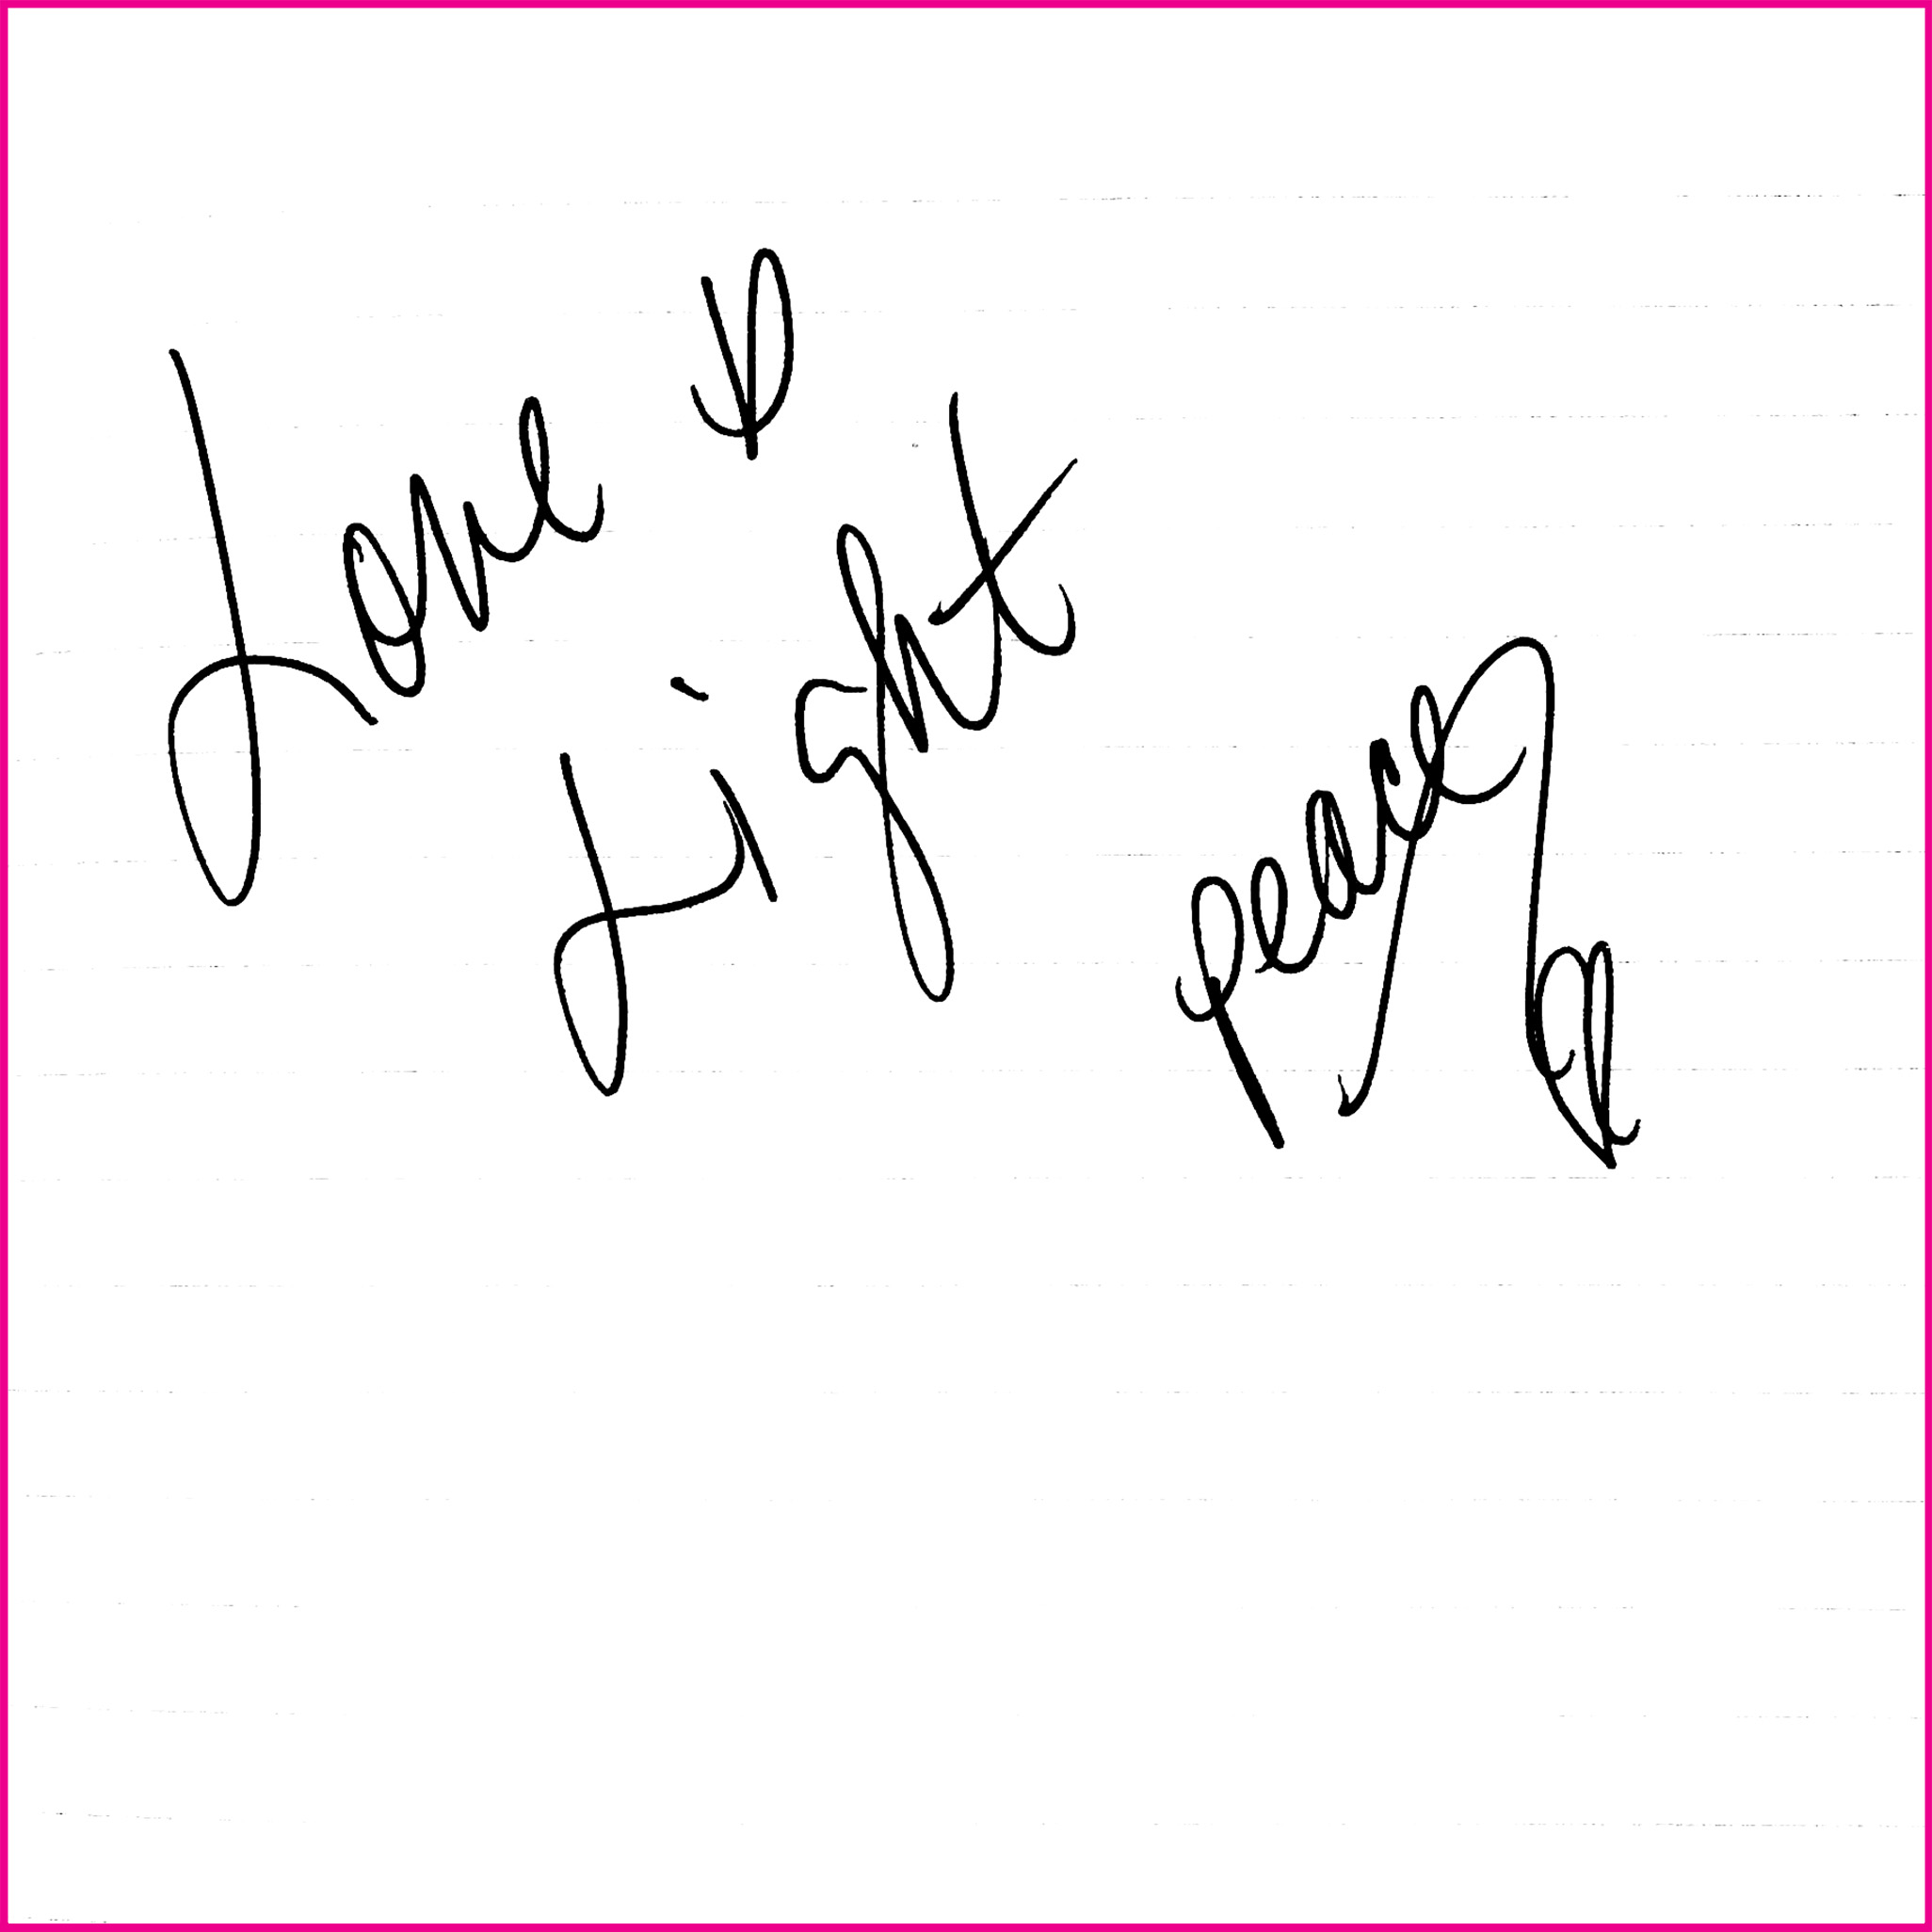 Love is light. Peace.